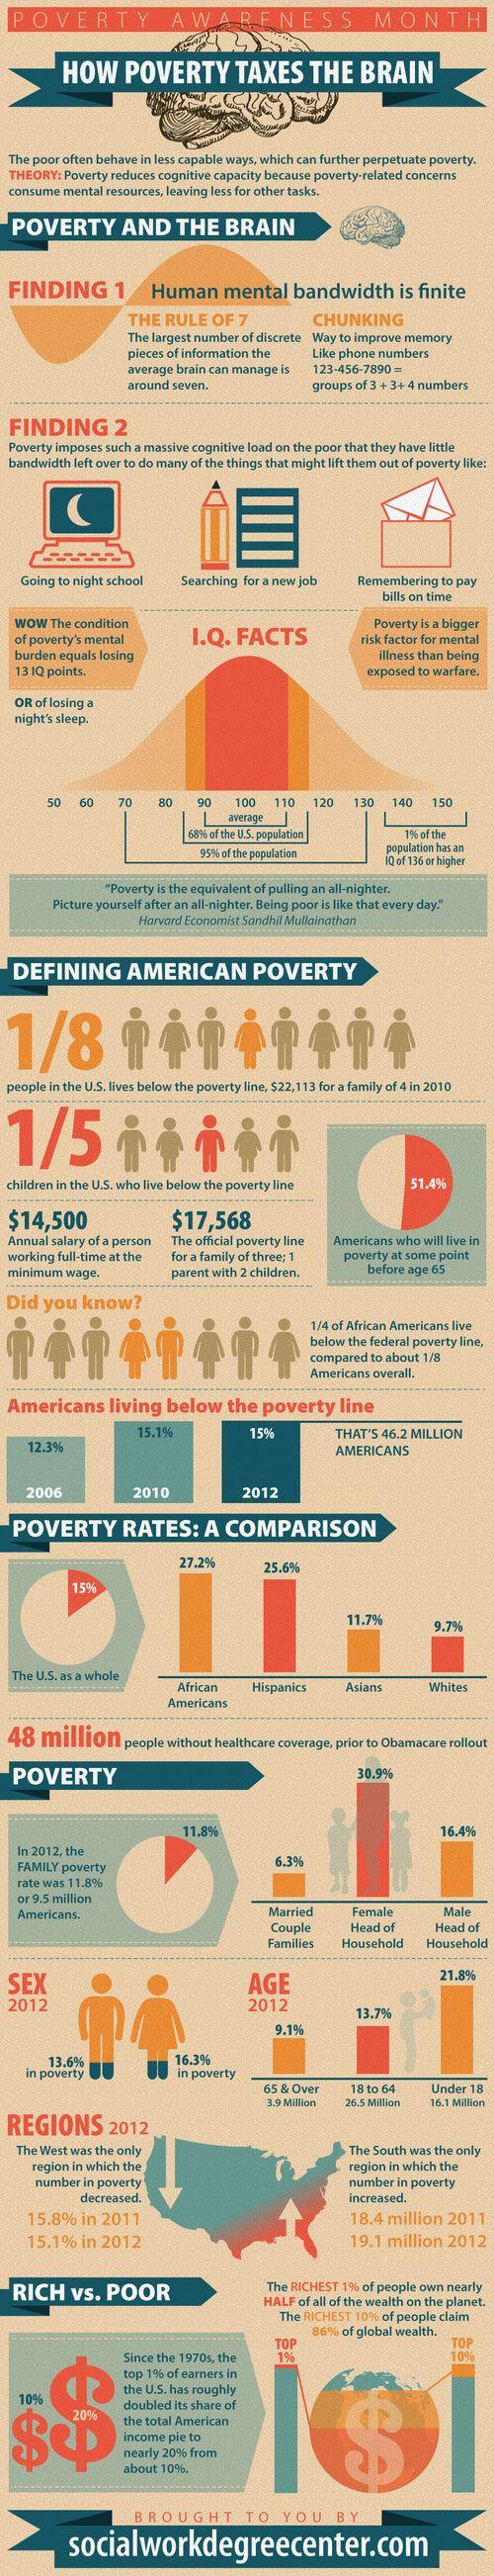 Poverty-on-the-Brain